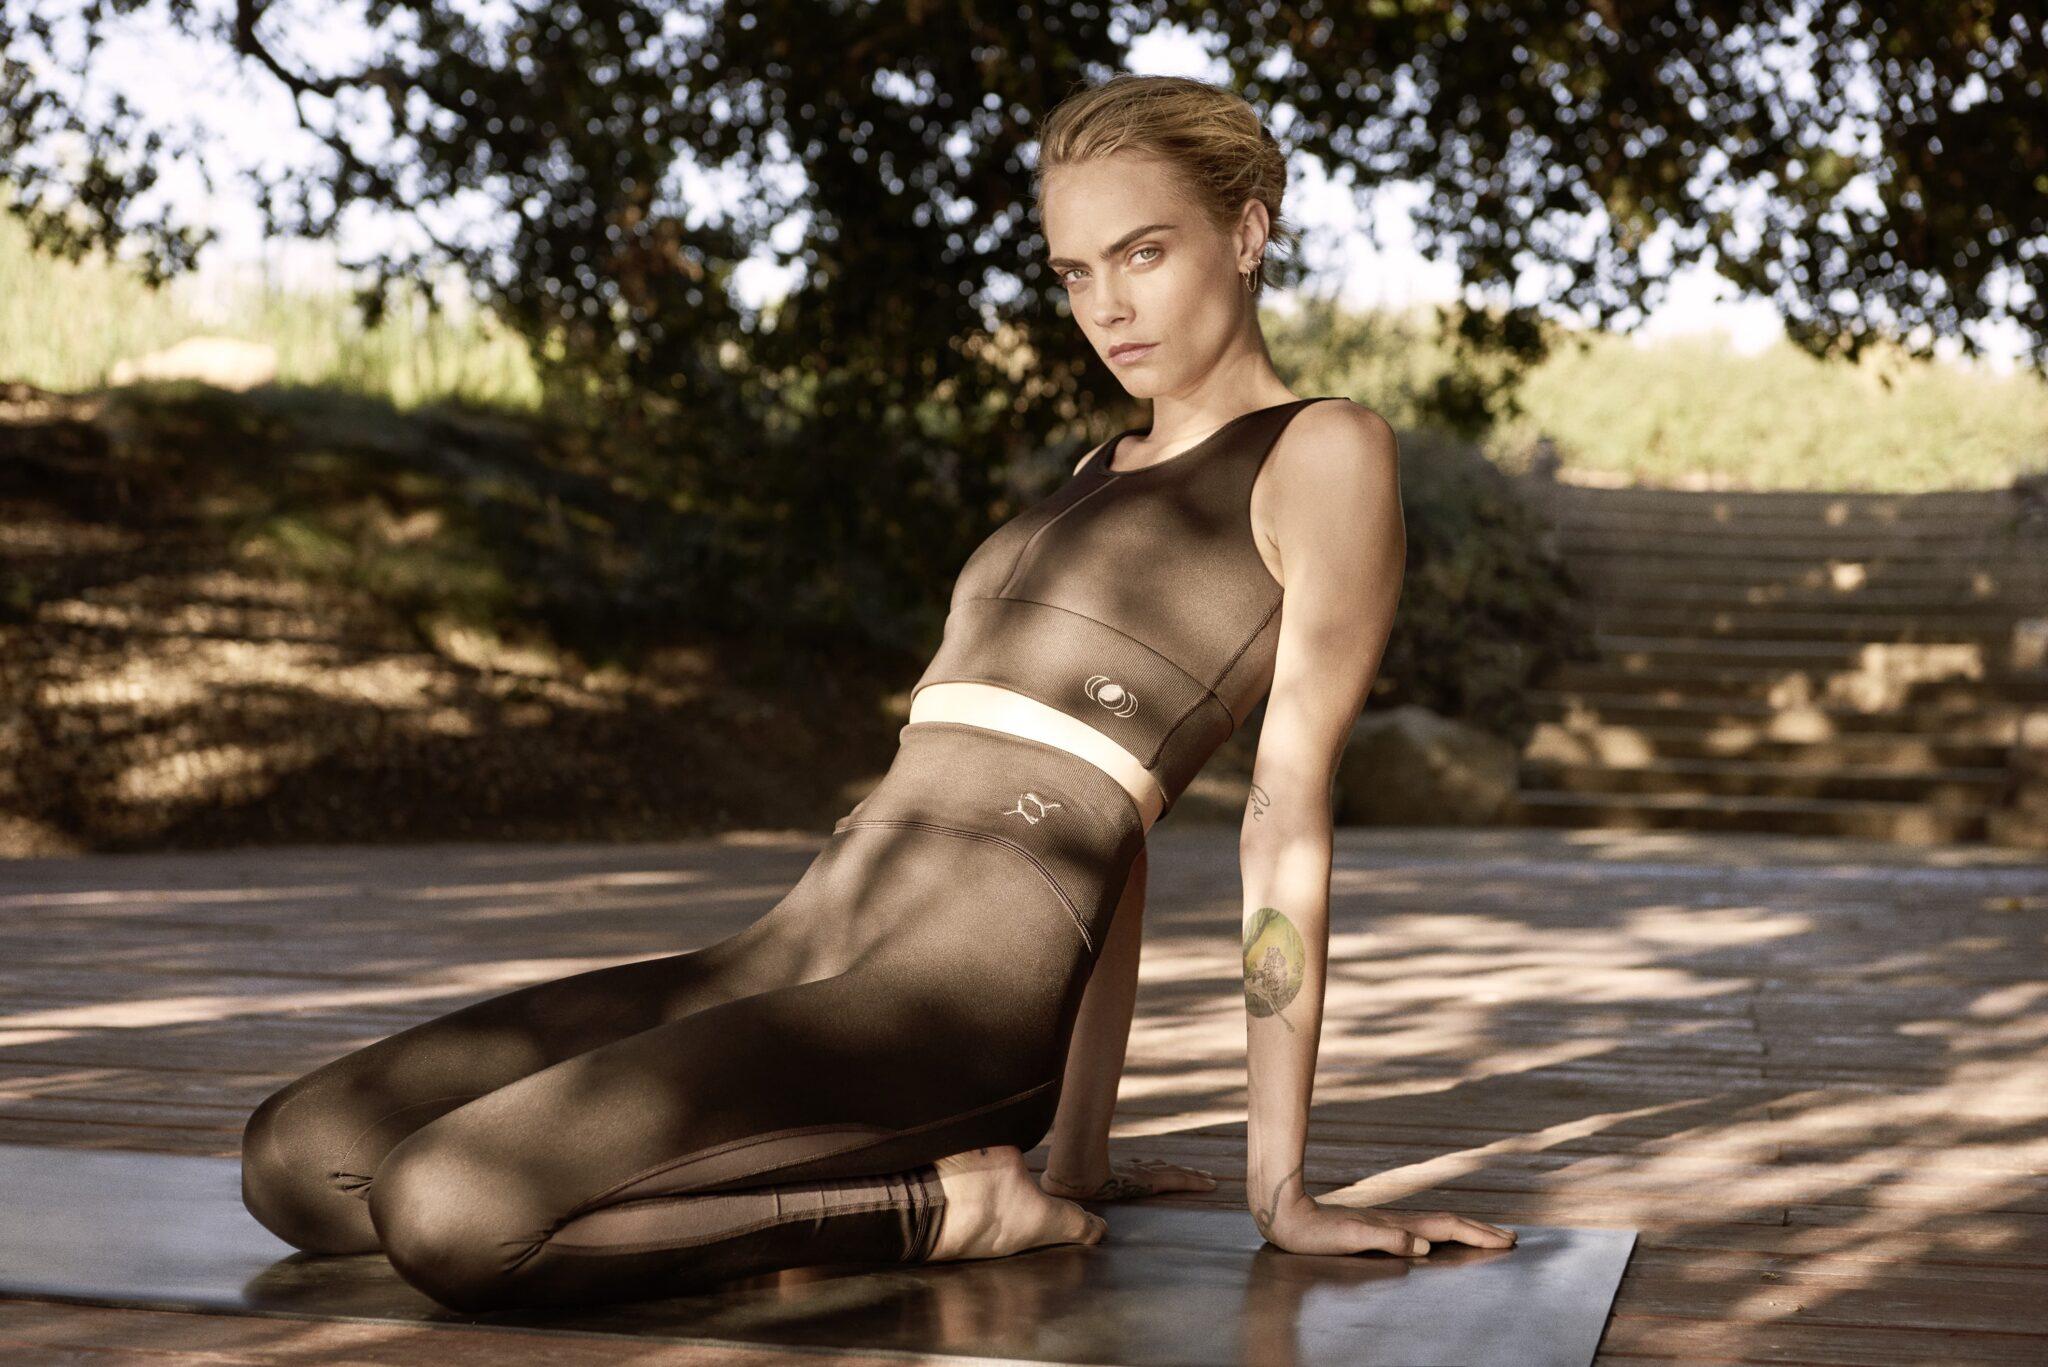 puma cara delevingne eco yoga wear 8